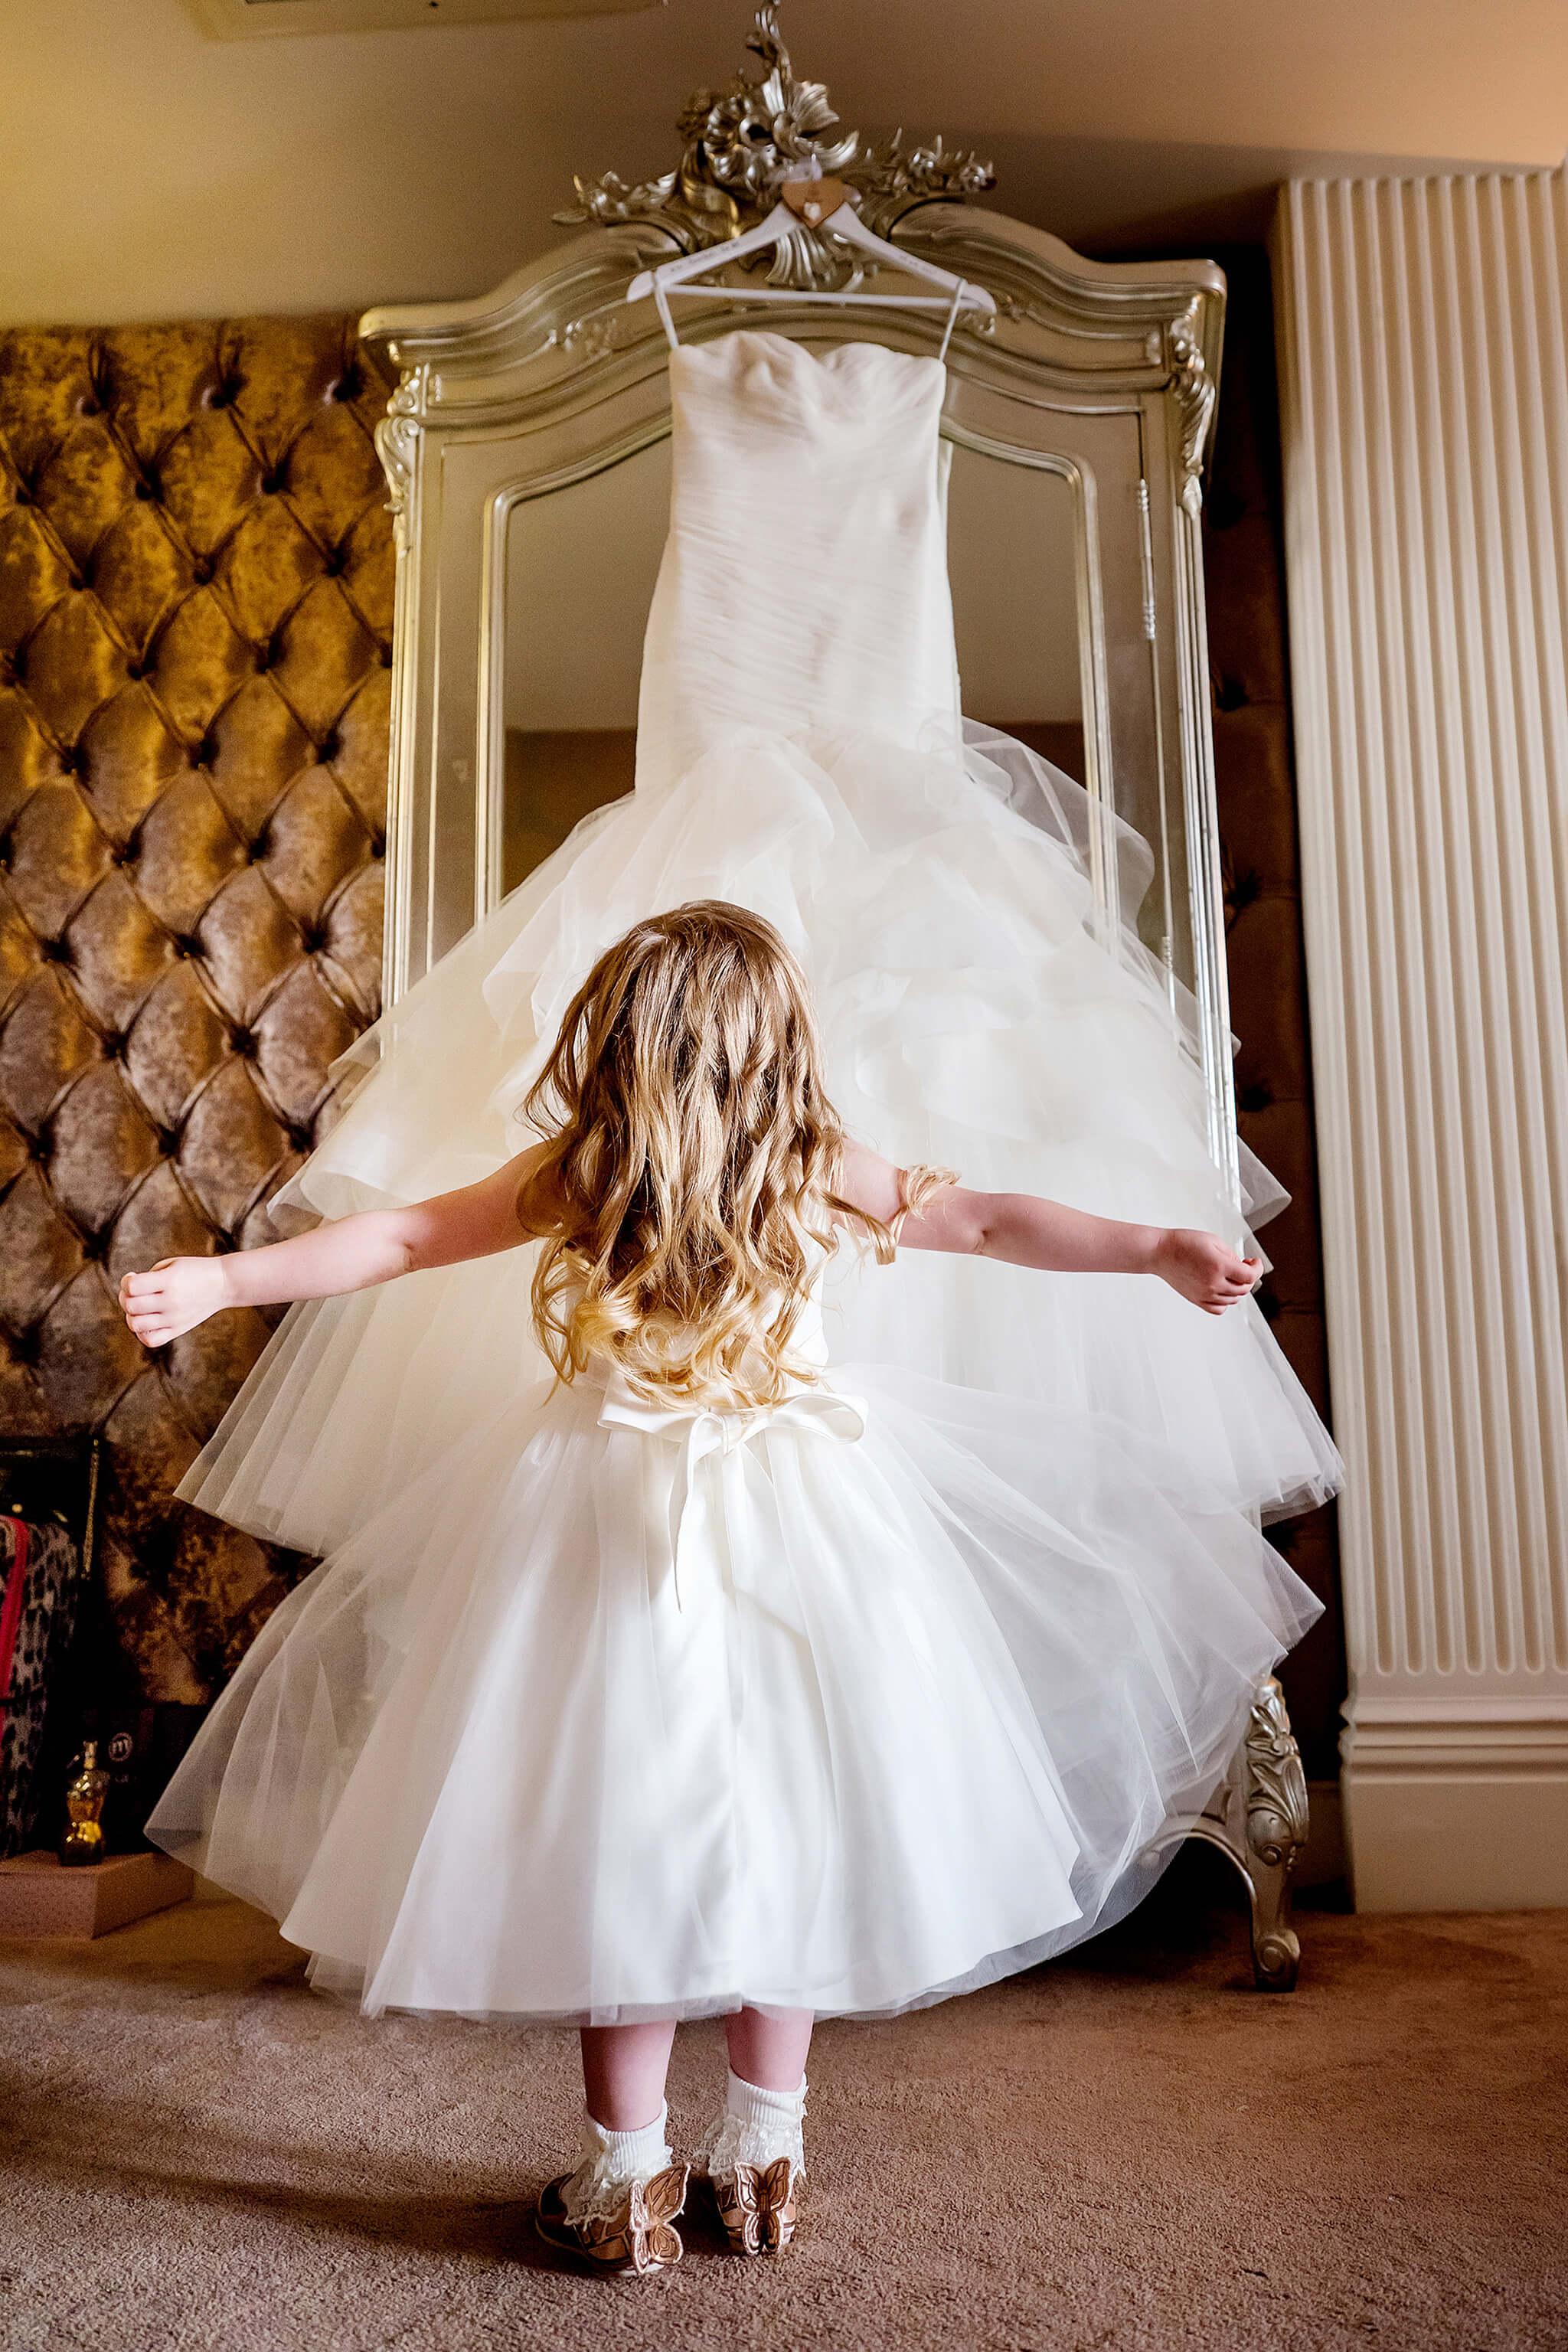 flowergirl-bridesmaid-weddingdress-weddingday-30-james-street-liverpool